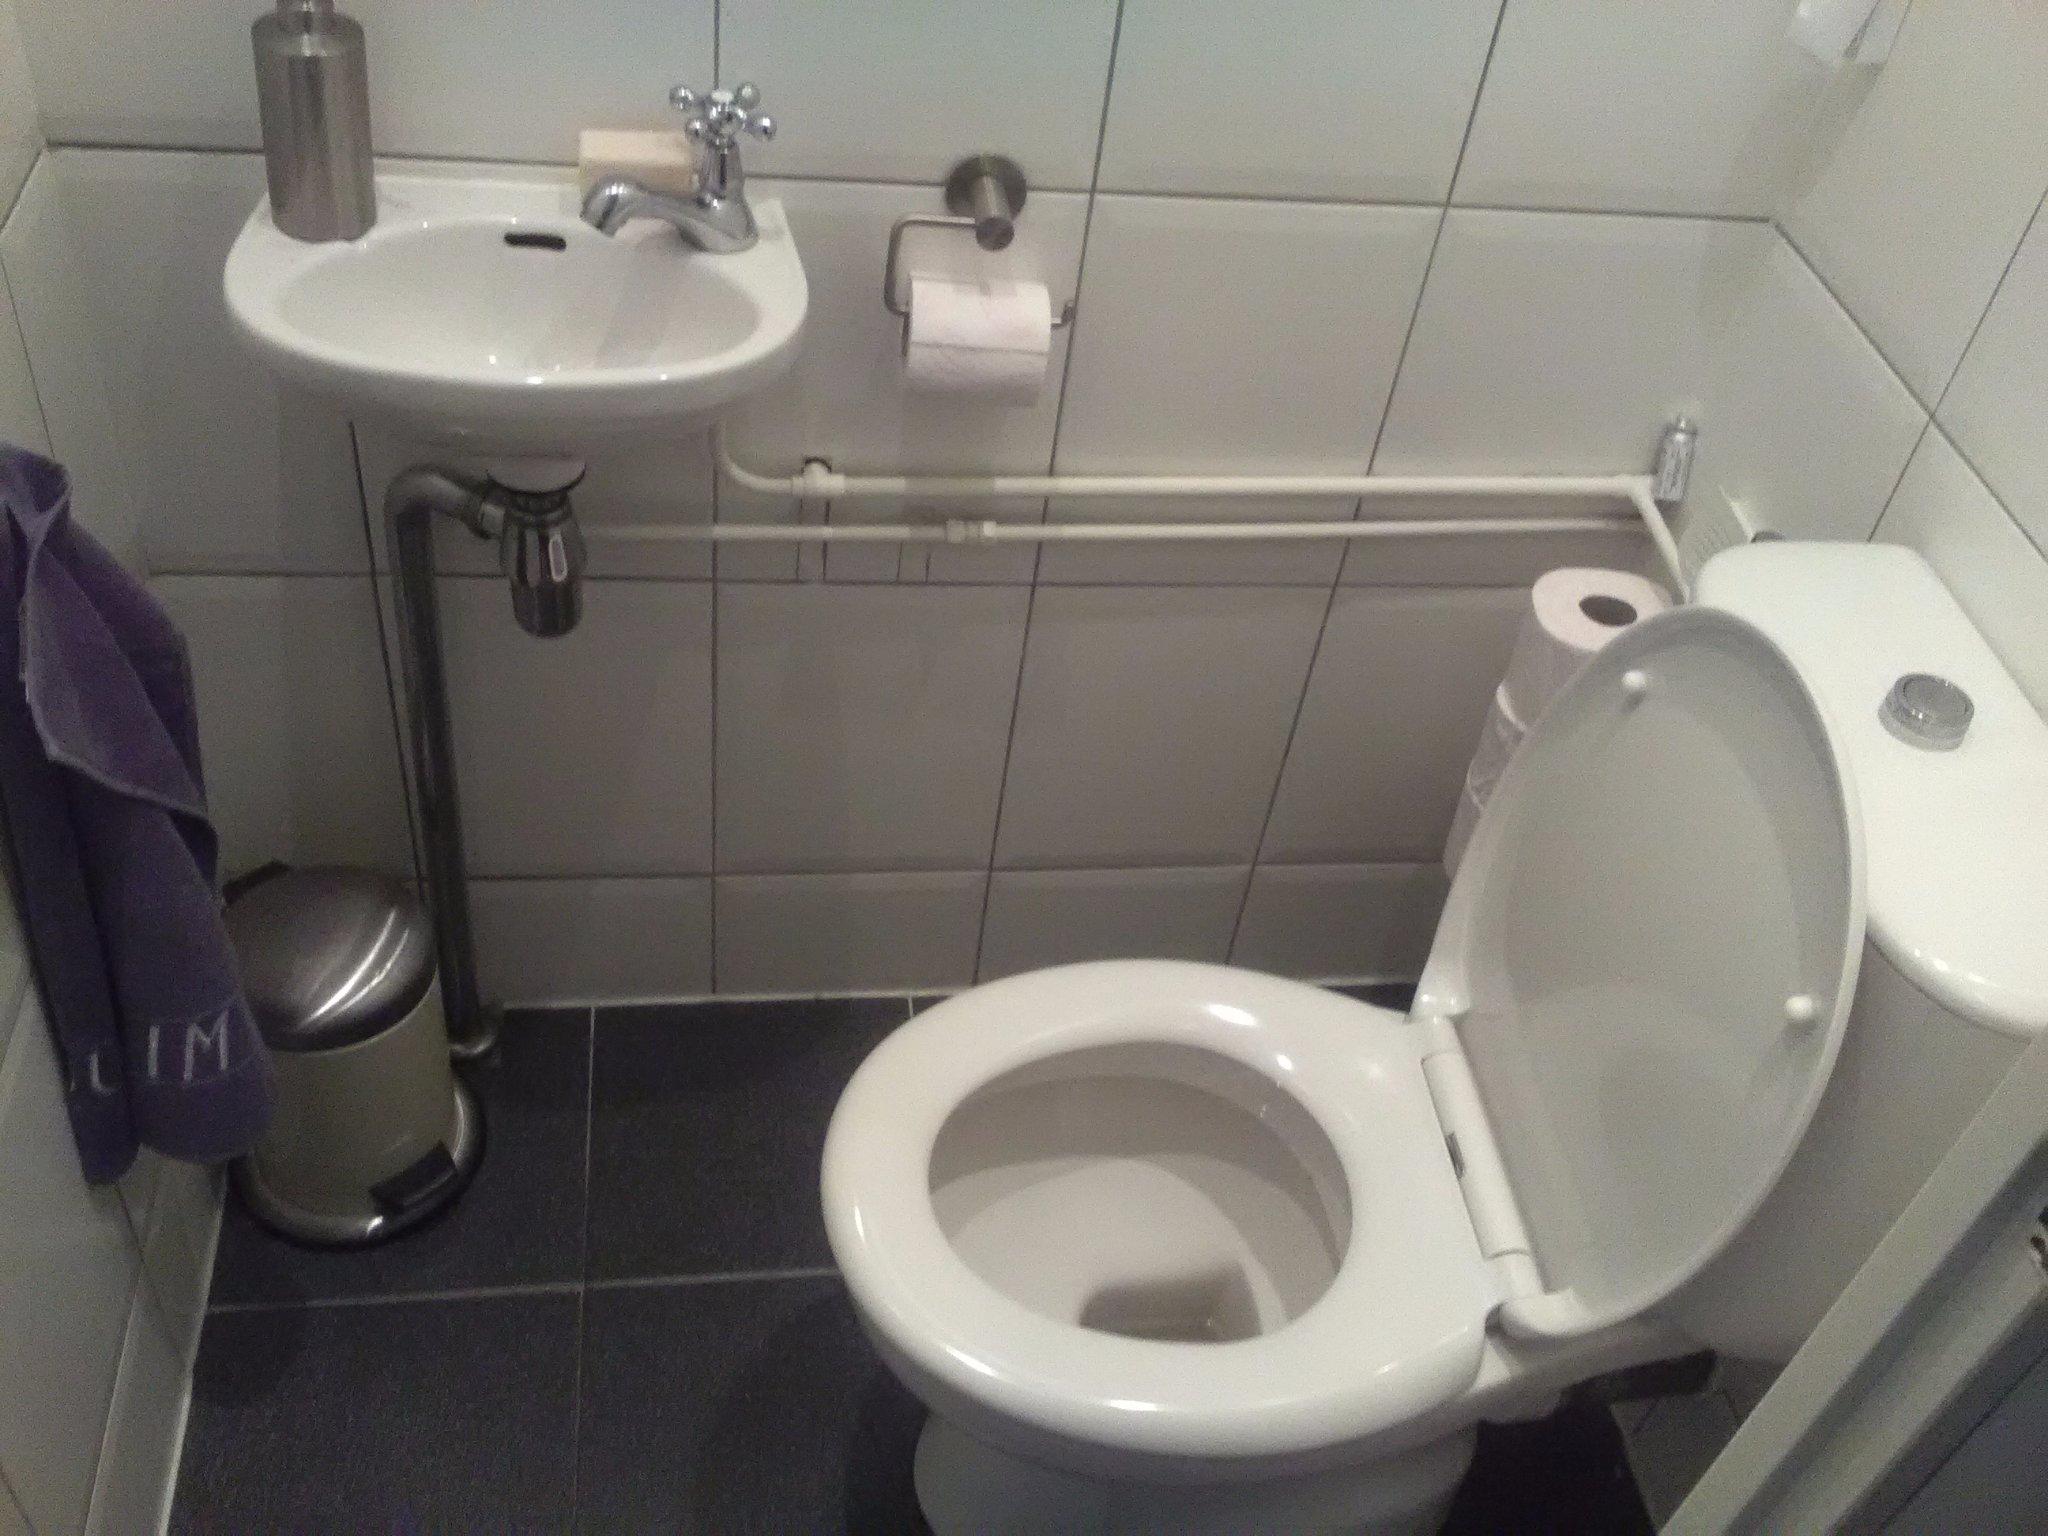 Hangend Toilet Plaatsen : Hangend toilet plaatsen vloer en voorzetwand tegelen werkspot